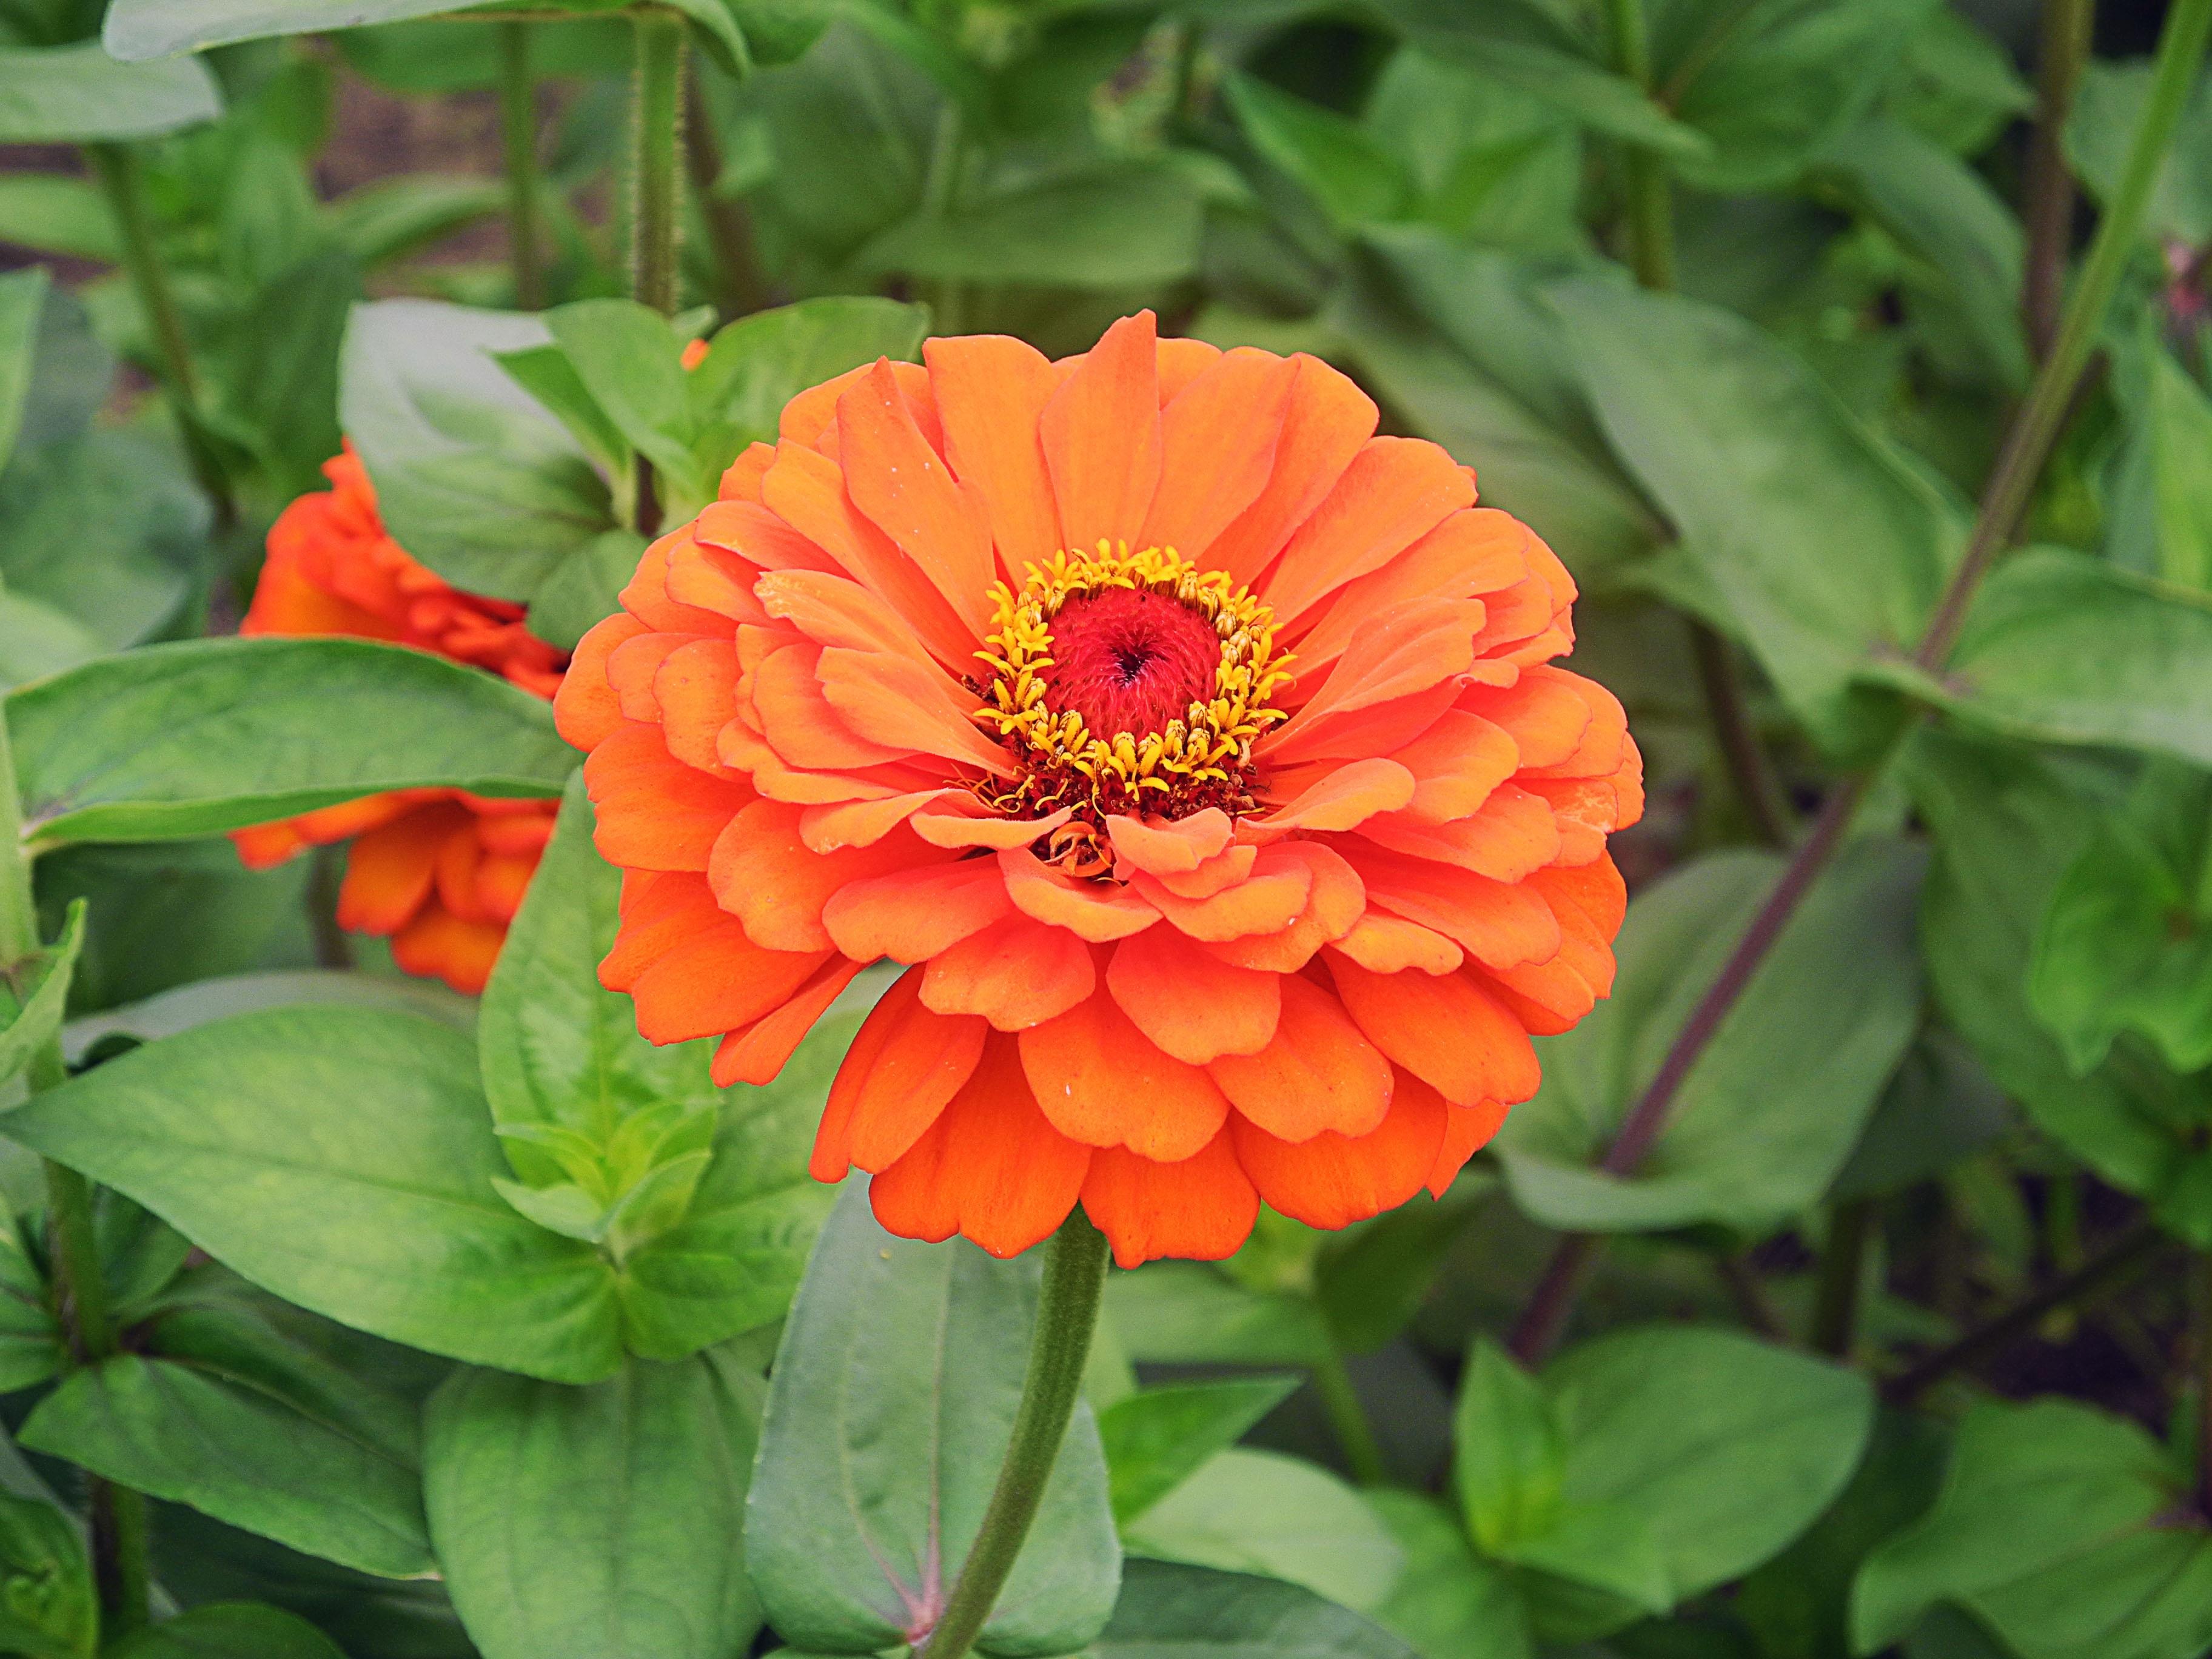 Free Images Nature Petal Botany Flora Dahlia Bright